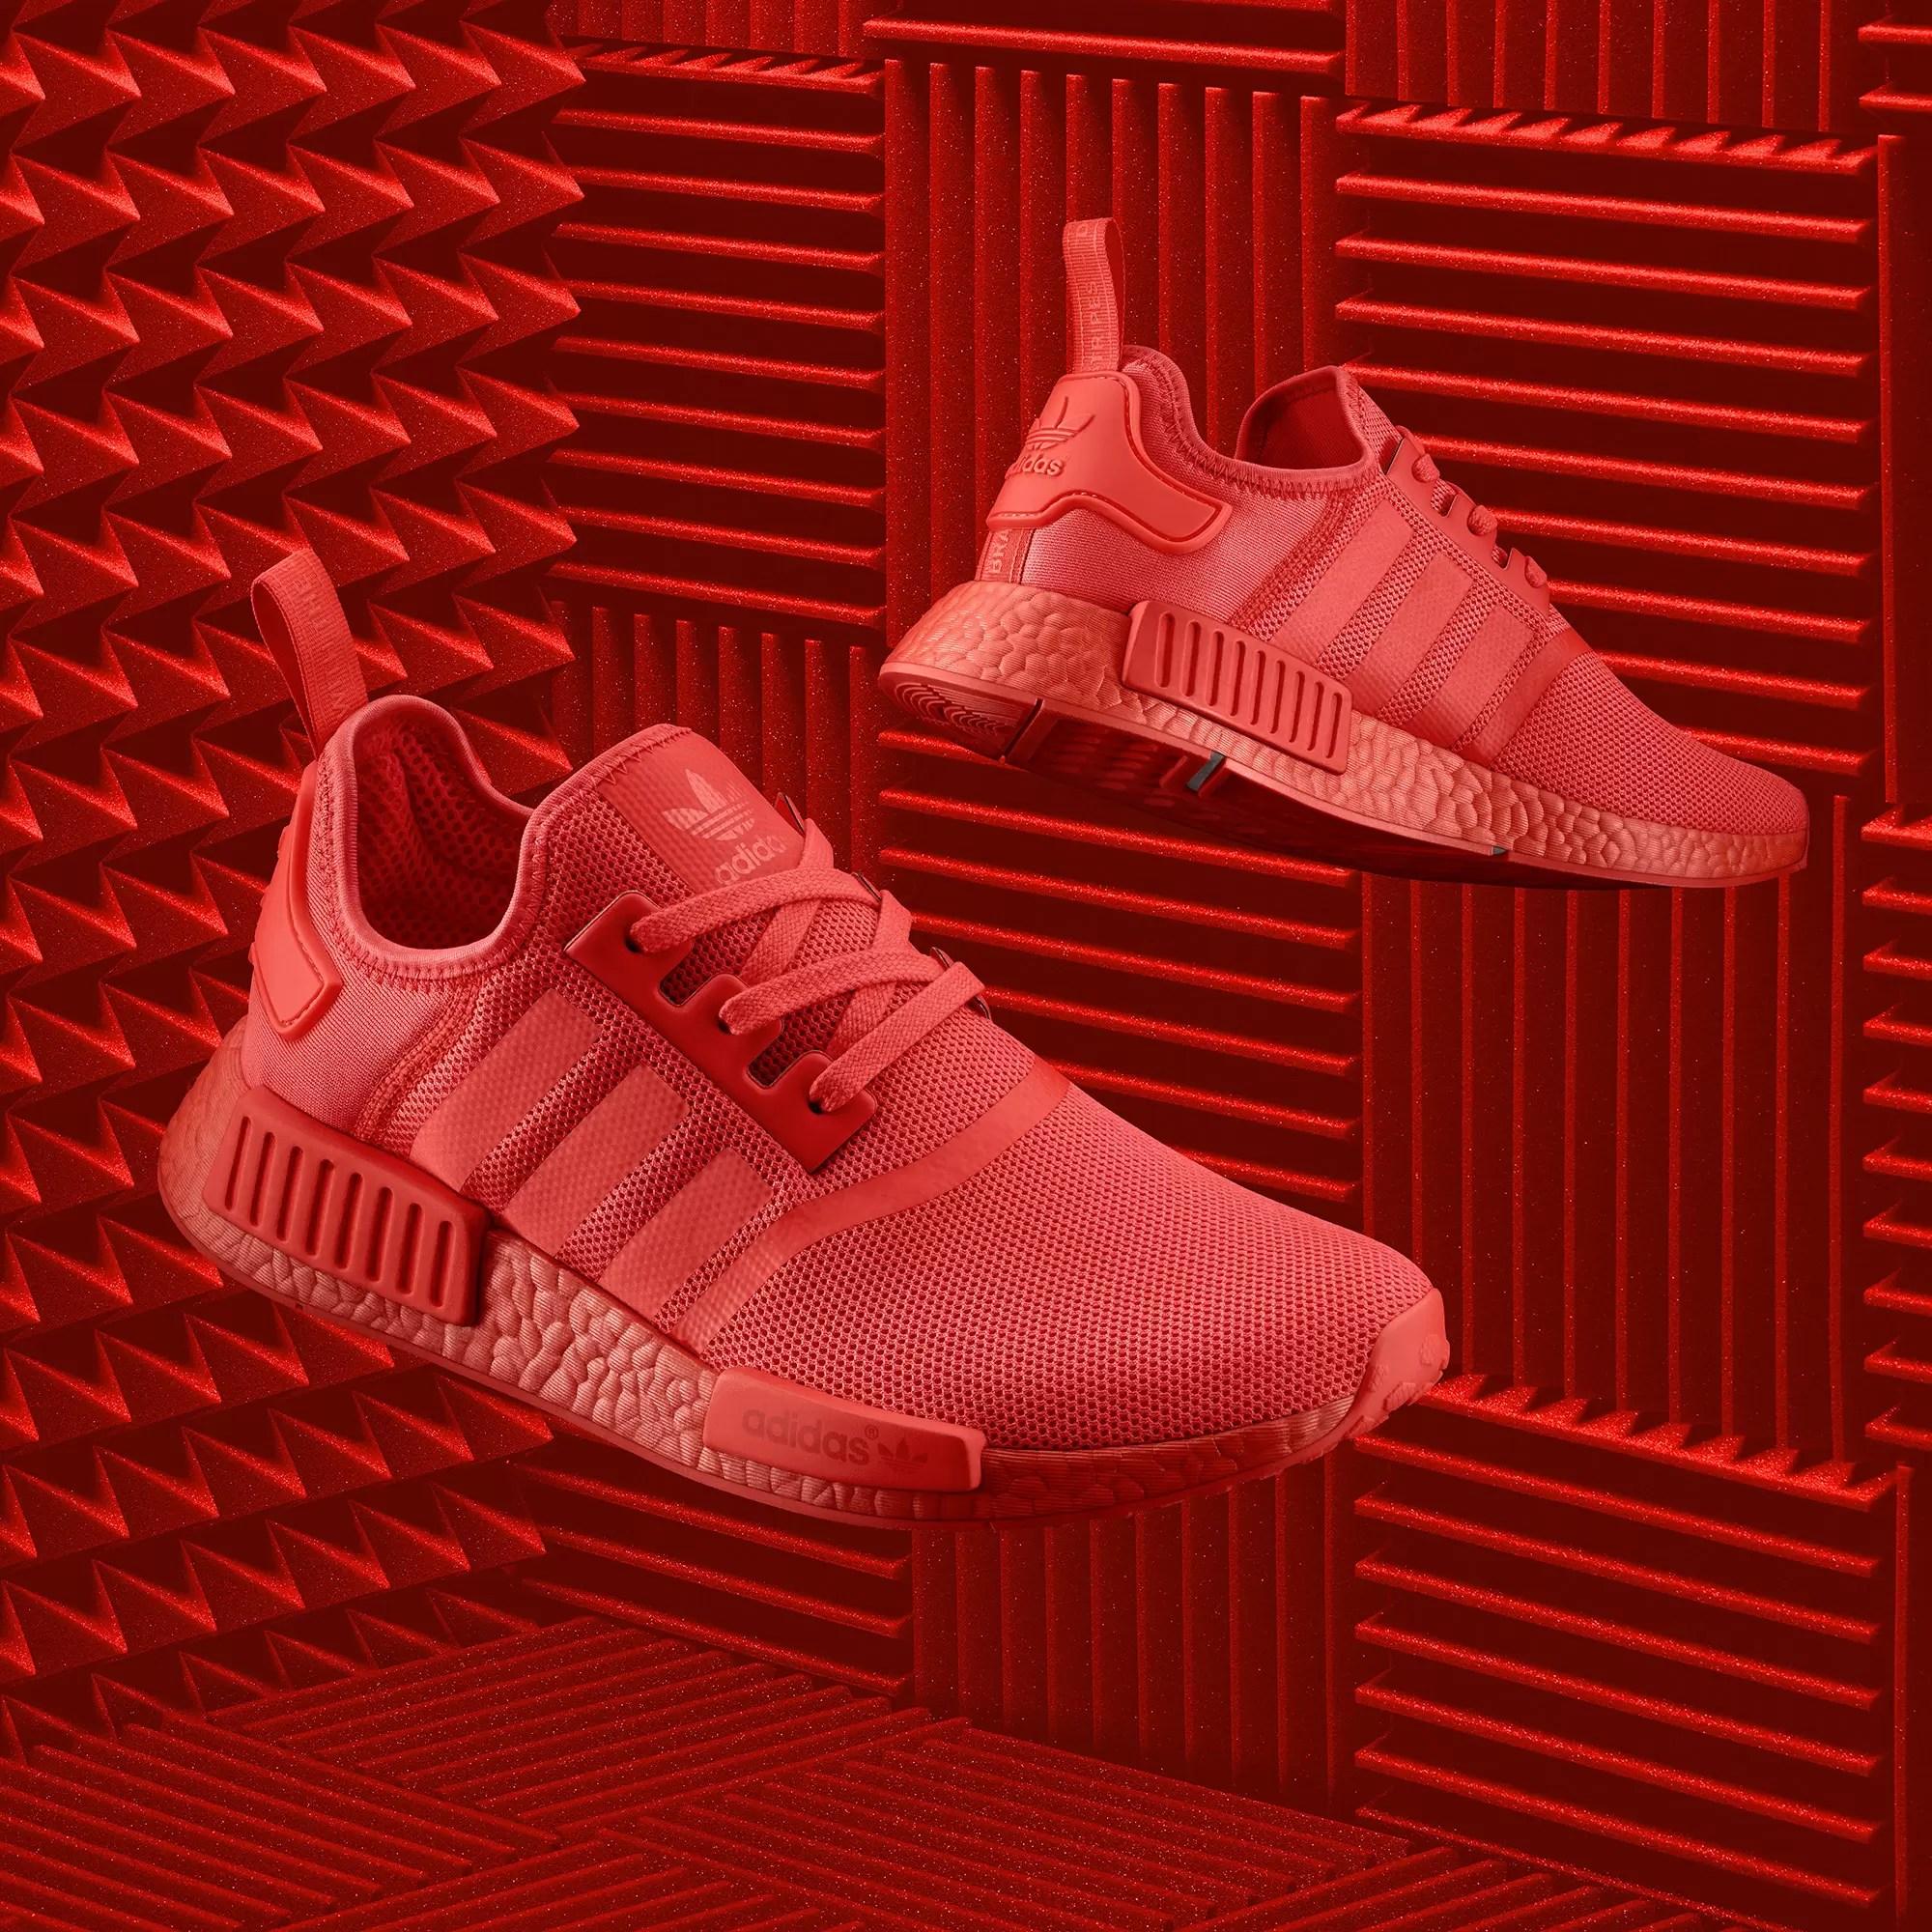 adidasNMD: adidas Originals' NMD Colour Boost Drops 17th